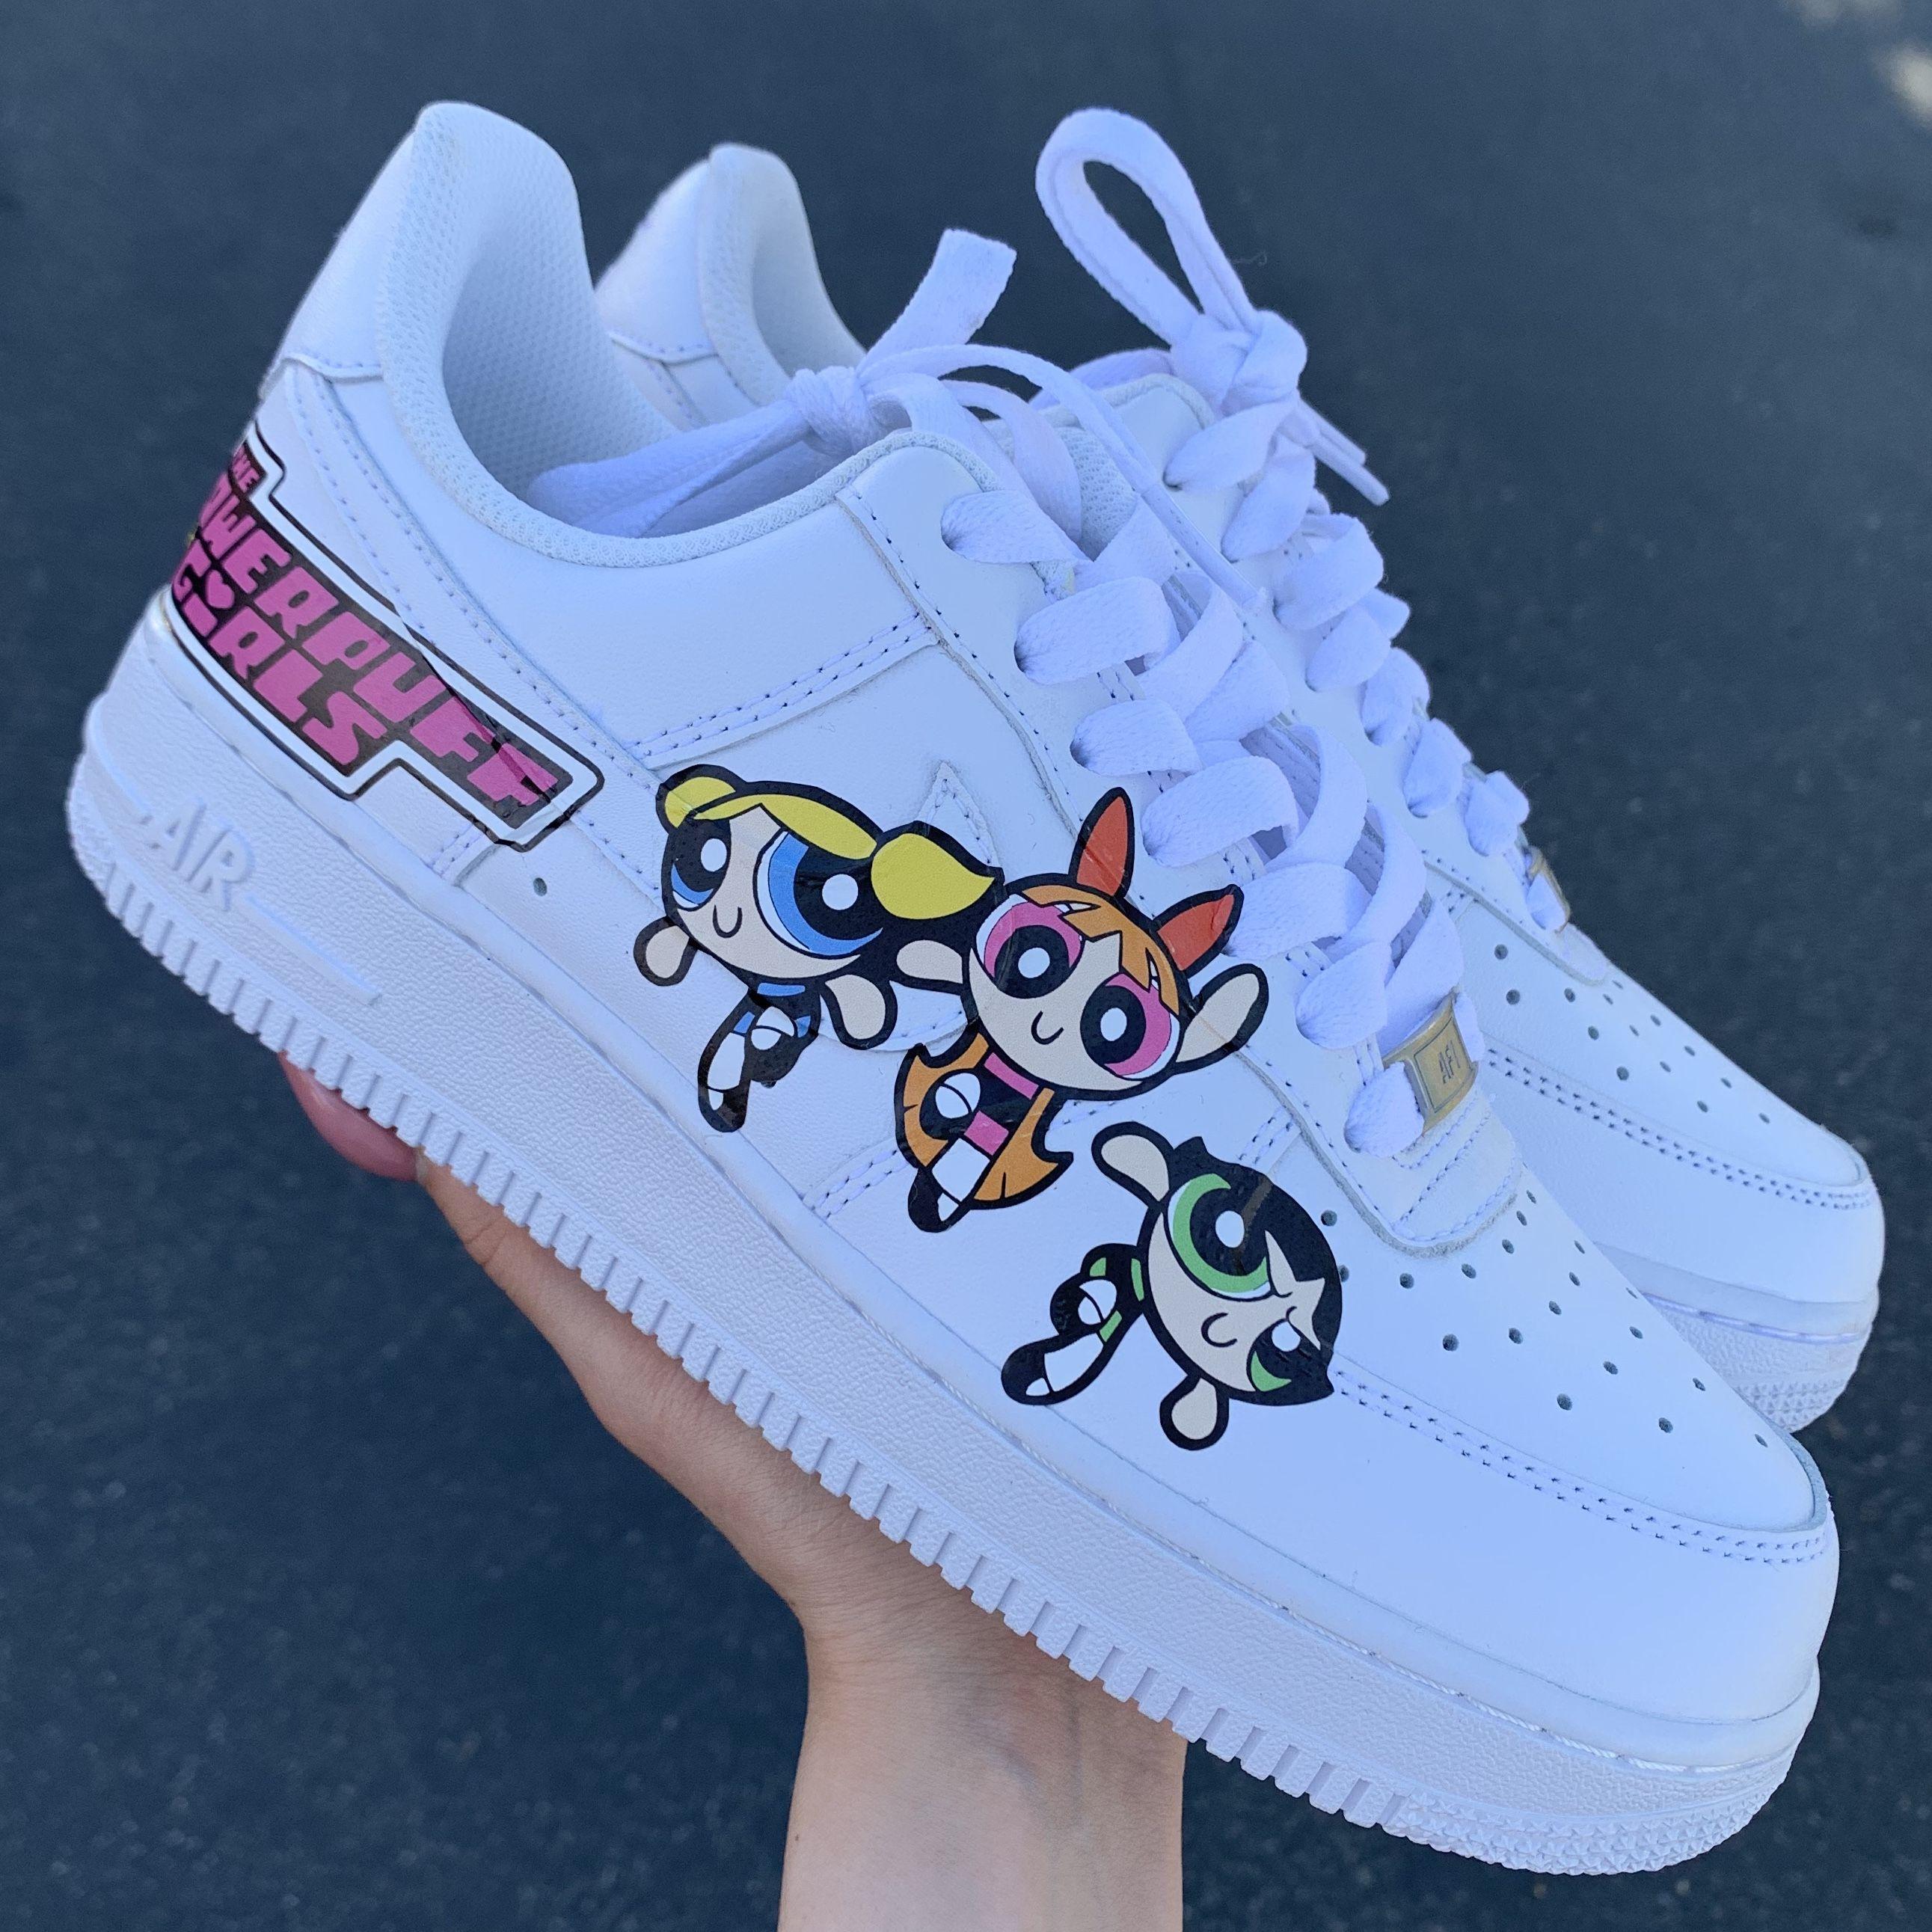 Powerpuff Girls Custom Sneakers Nike Air Shoes Custom Nike